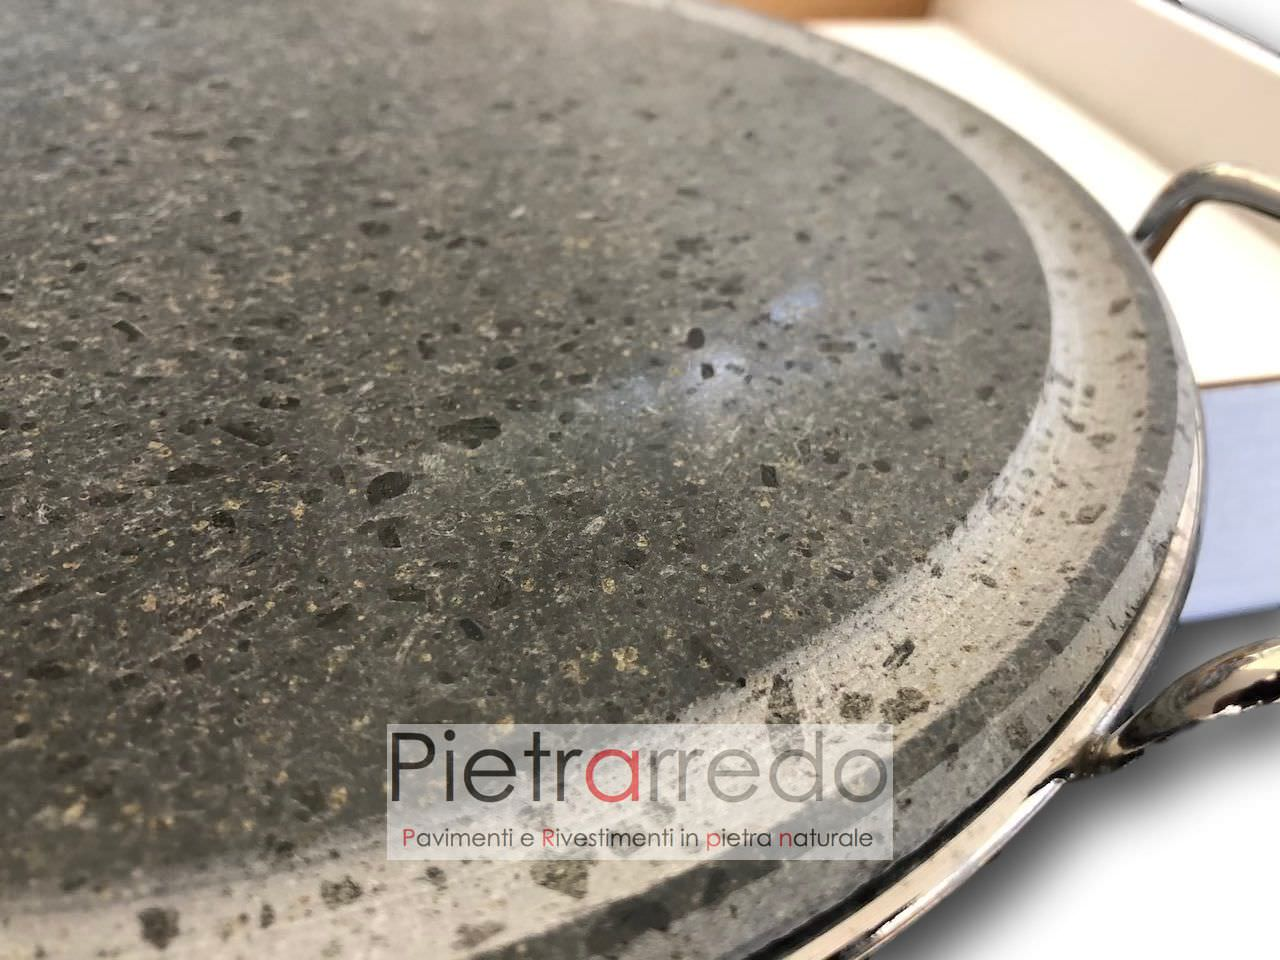 costo pentola lastra piastra in pietra ollare cucina sana offerta tonda bbq barbeque pietrarredo milano